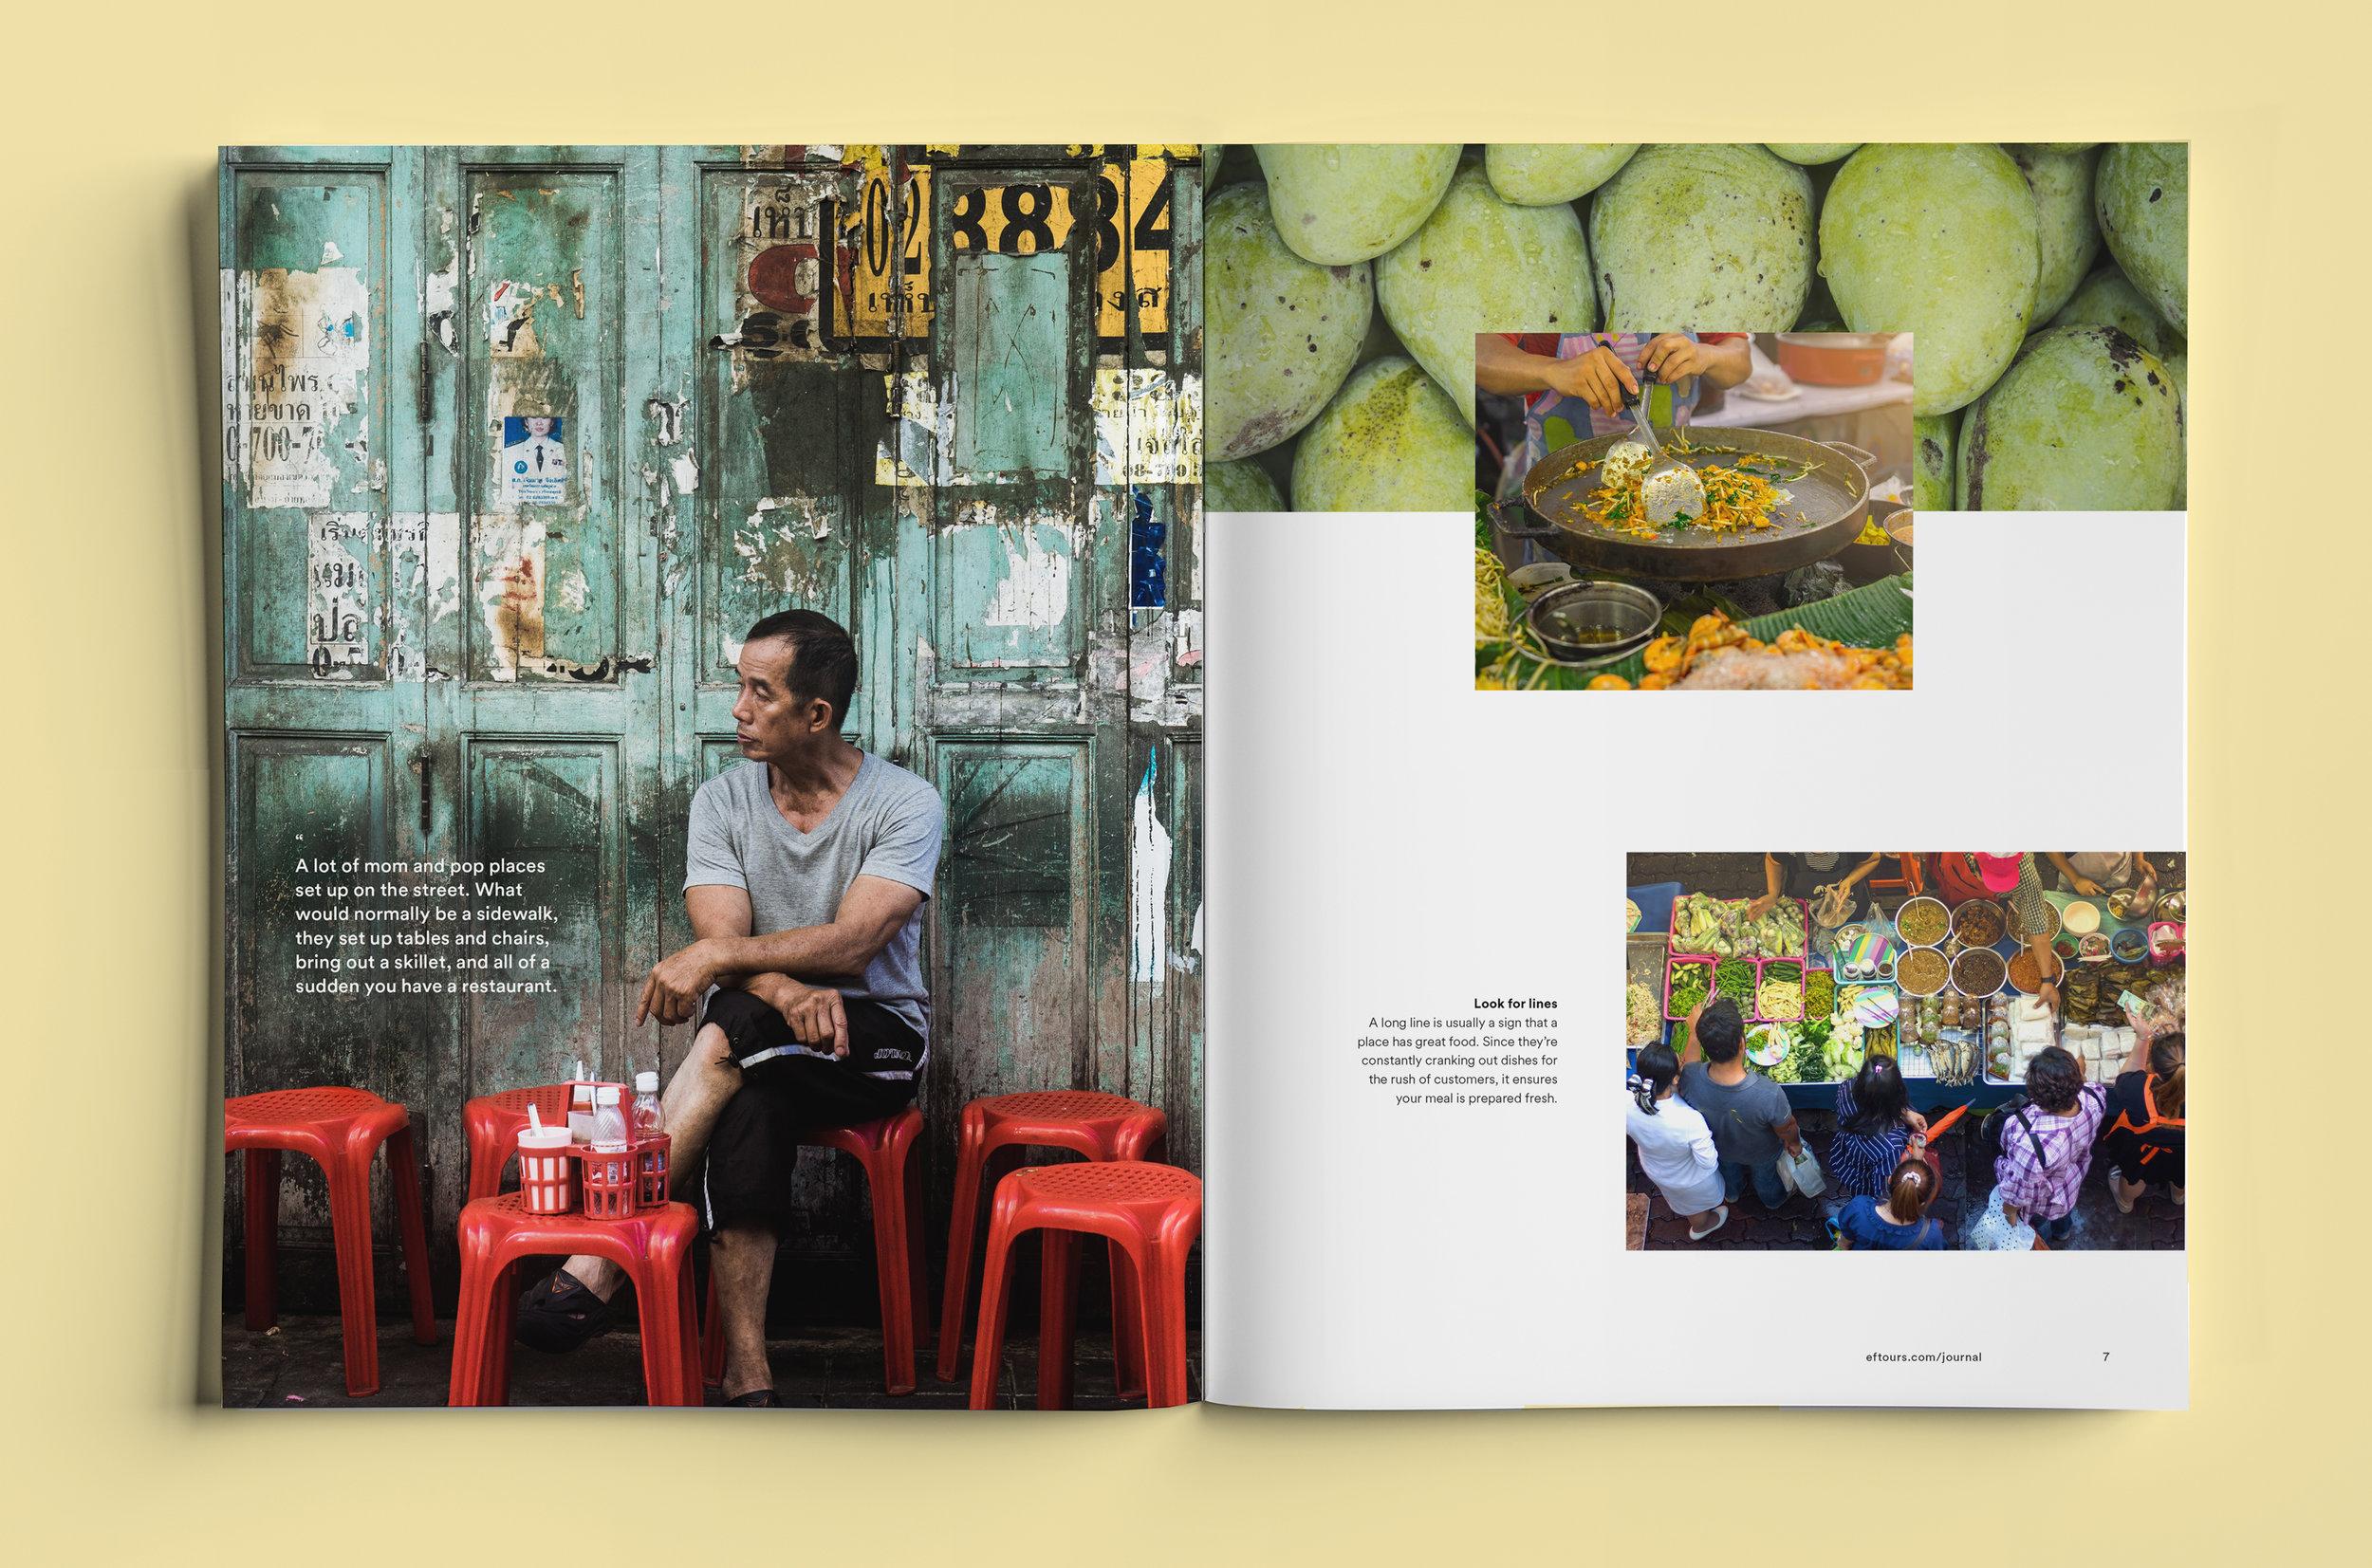 photo essay - EF journal piece on street food in Bangkok.